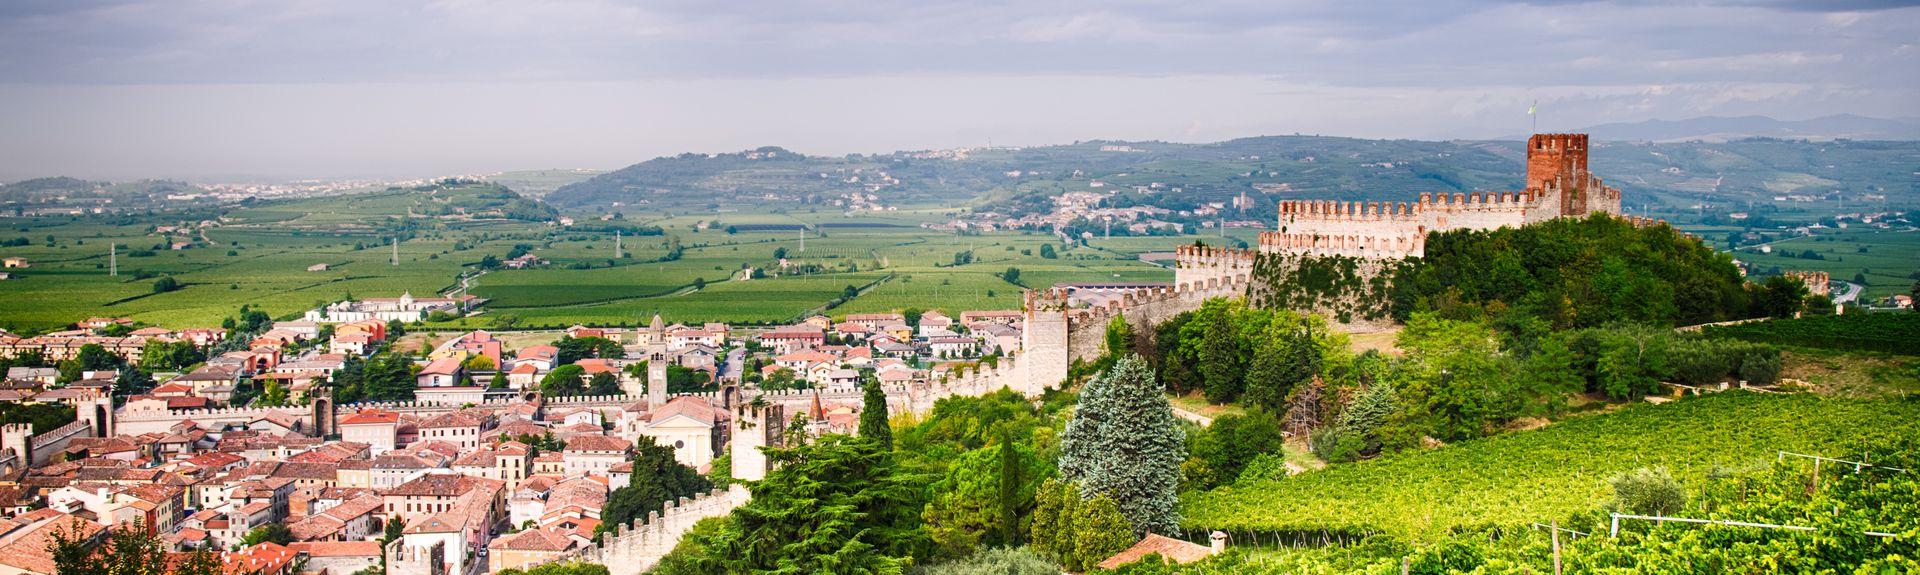 Vêneto, Italy